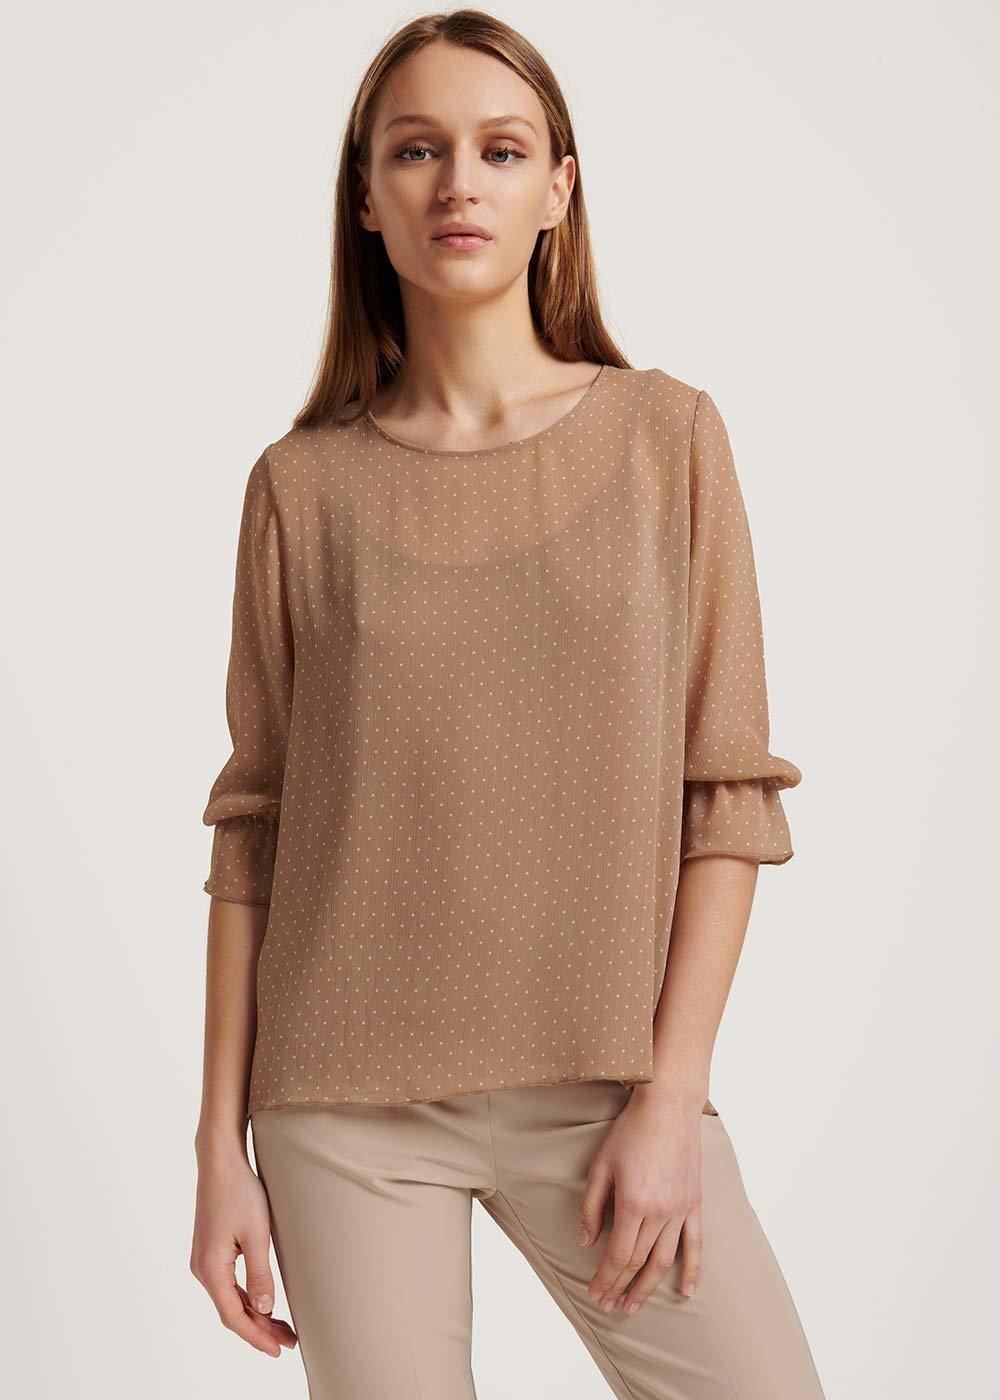 T-shirt Sonia a pois - Skin \ White \ Pois - Donna